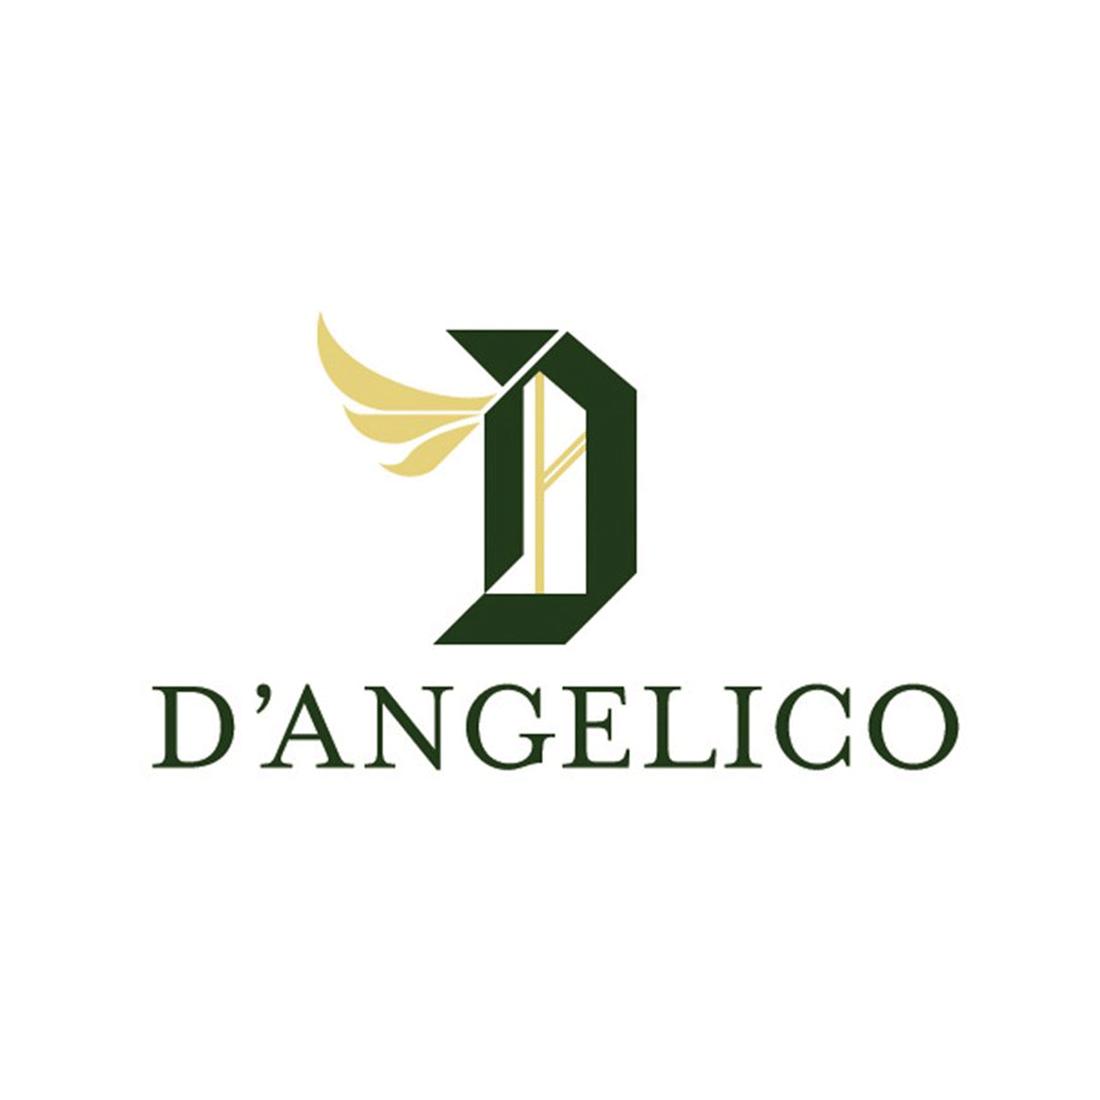 dangelico-logo.png